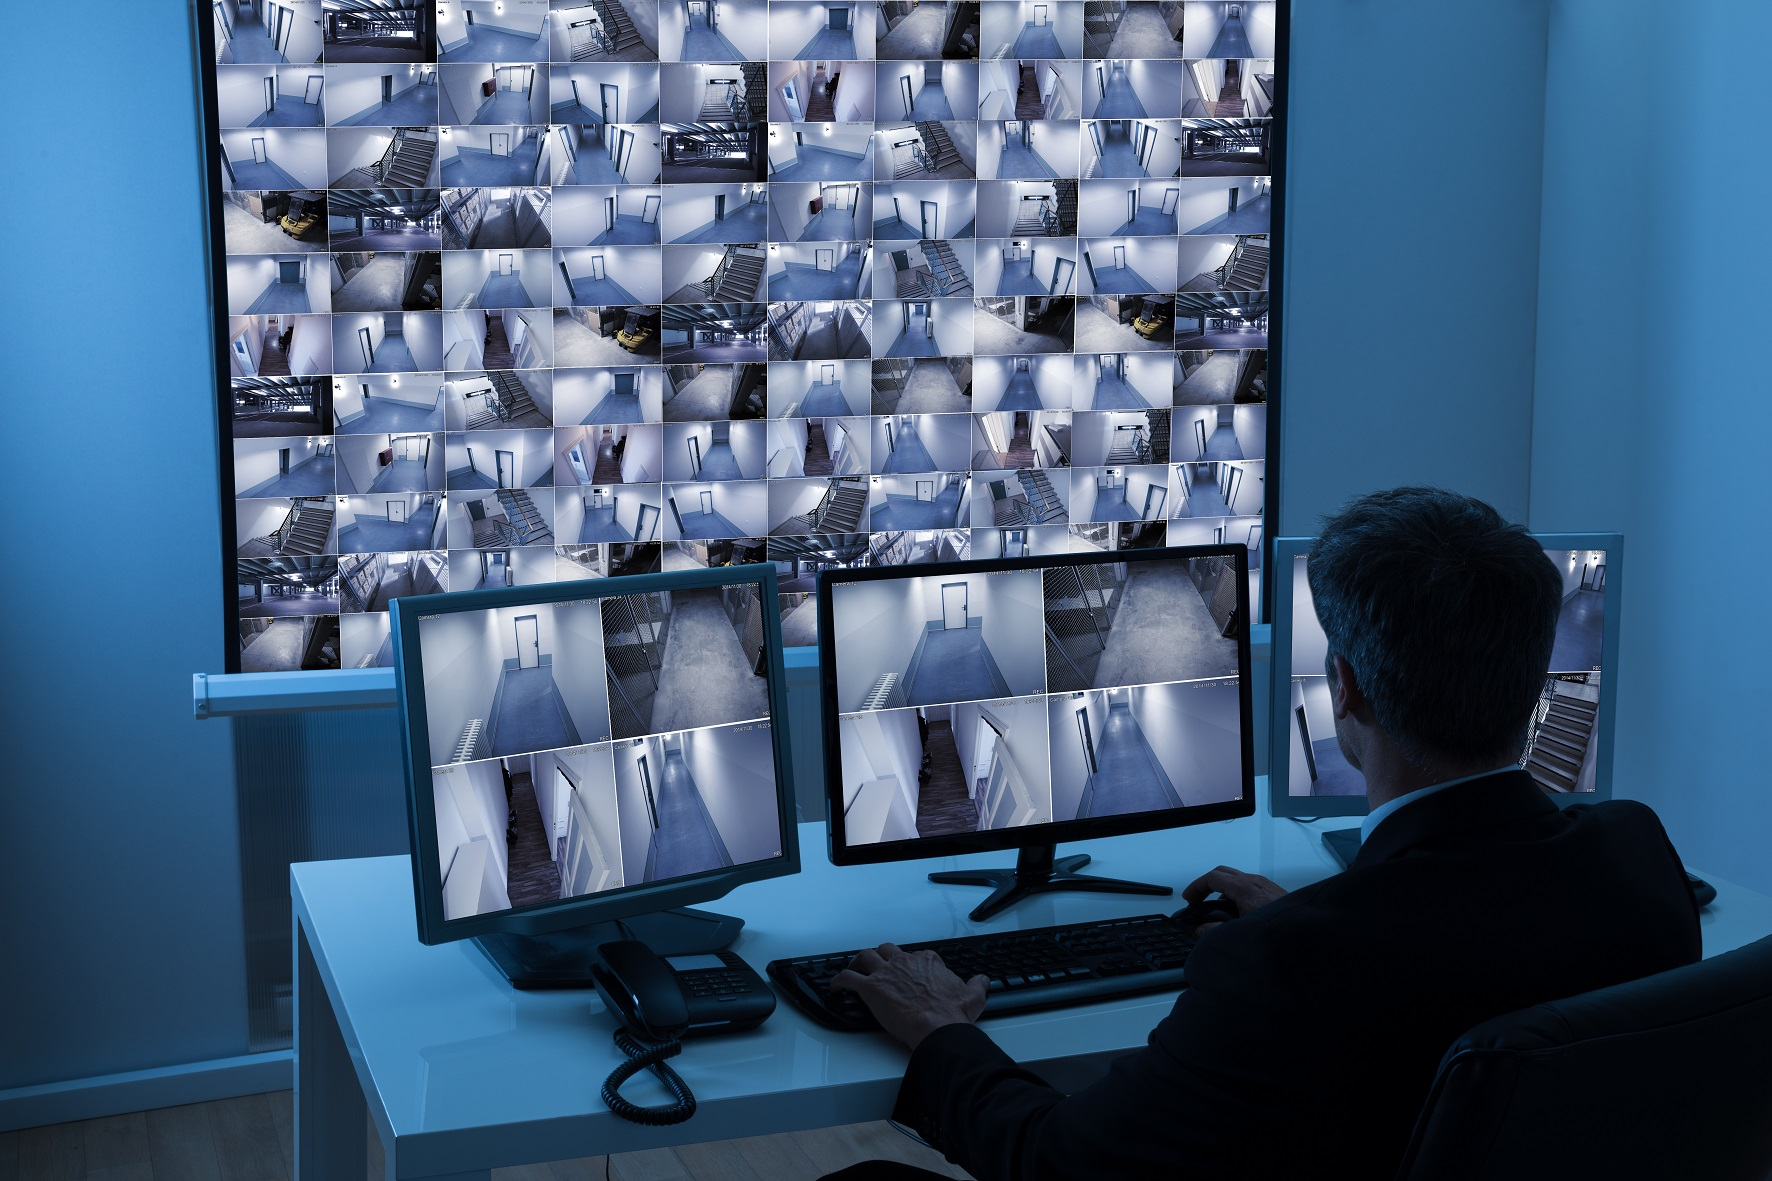 Охранный мониторинг